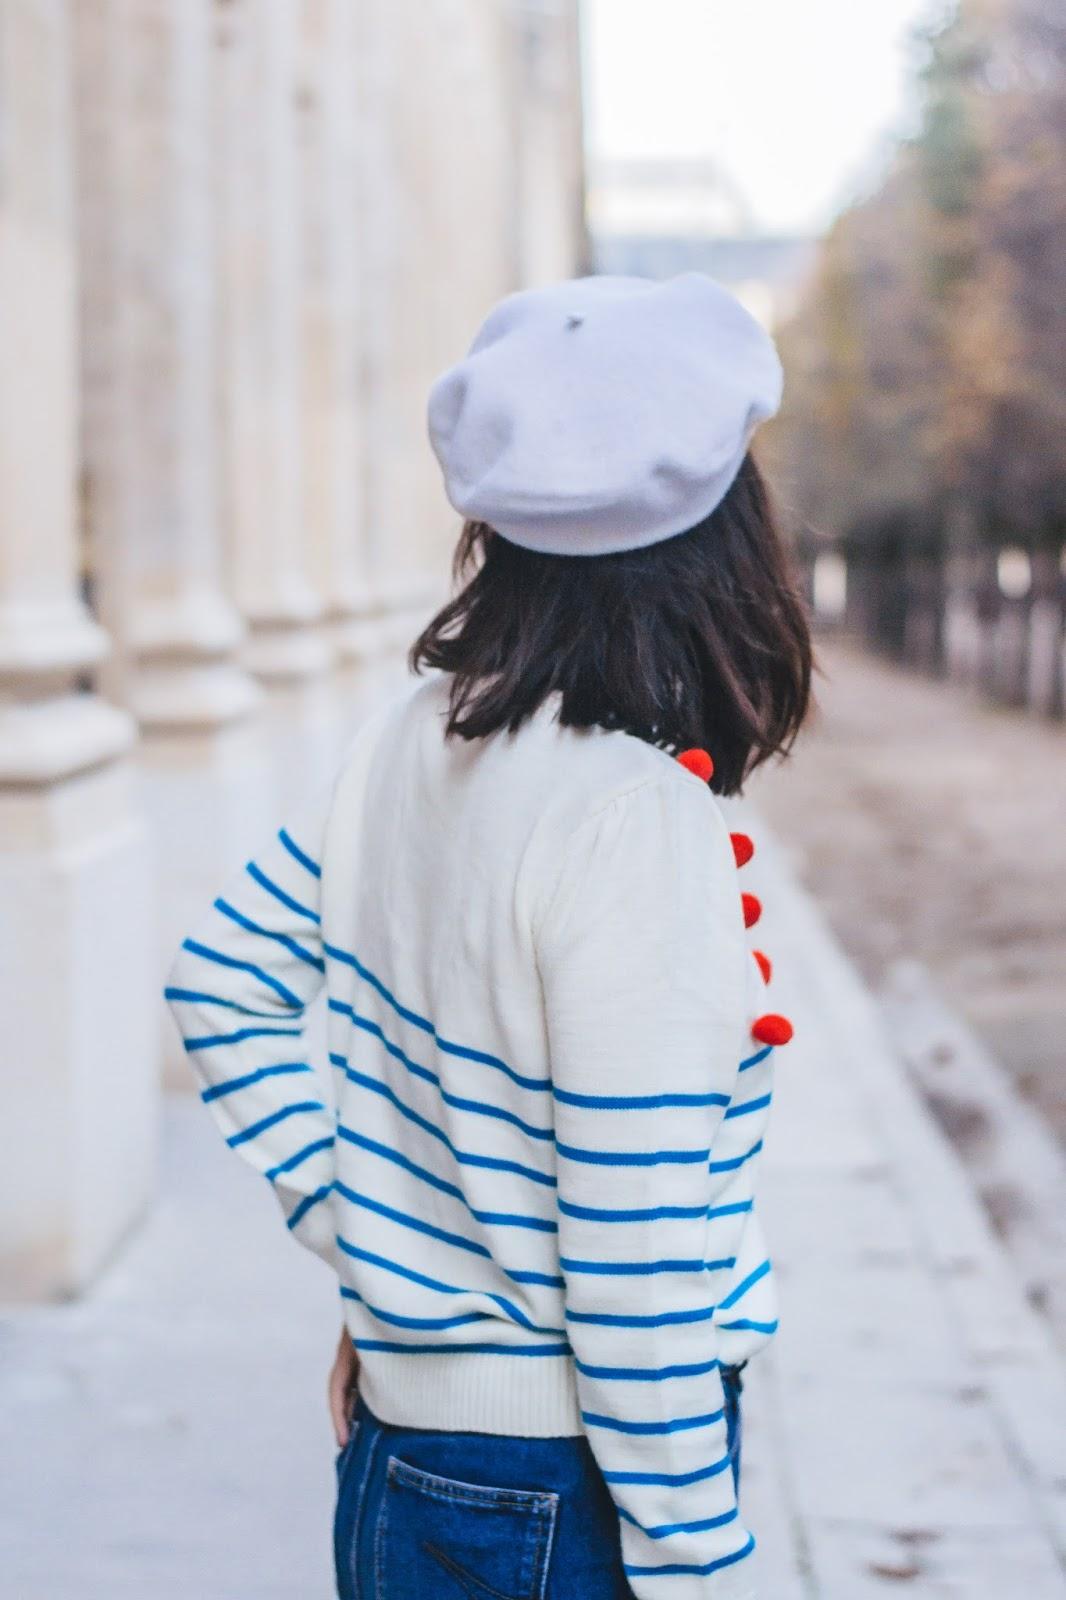 meetmeinparee-paris-mode-style-look-fashion-cutestyle-manoush